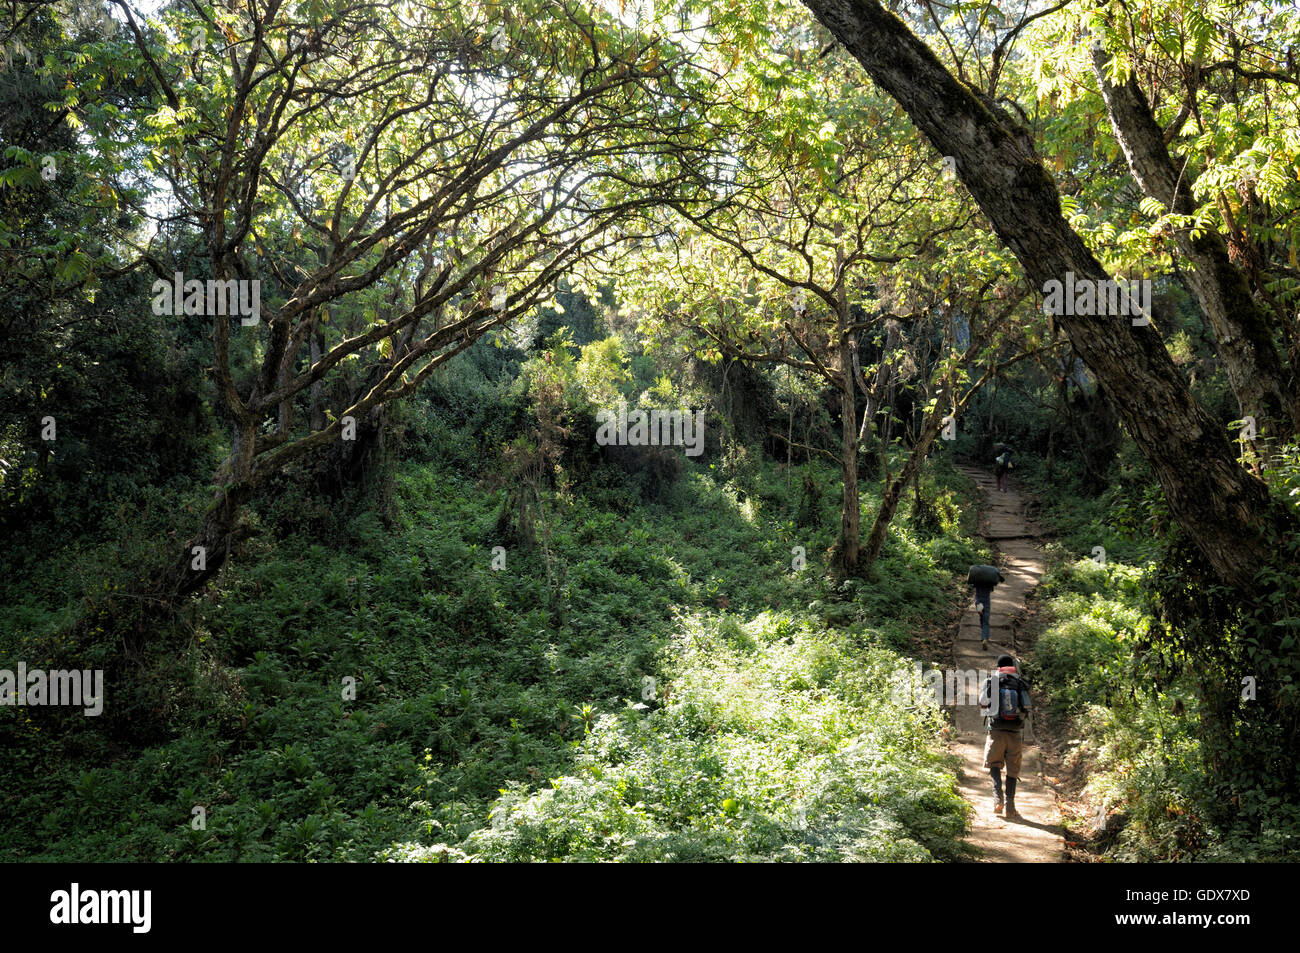 Lemosho trail in the montane rainforest, Mount Kilimanjaro National Park, Tanzania Stock Photo